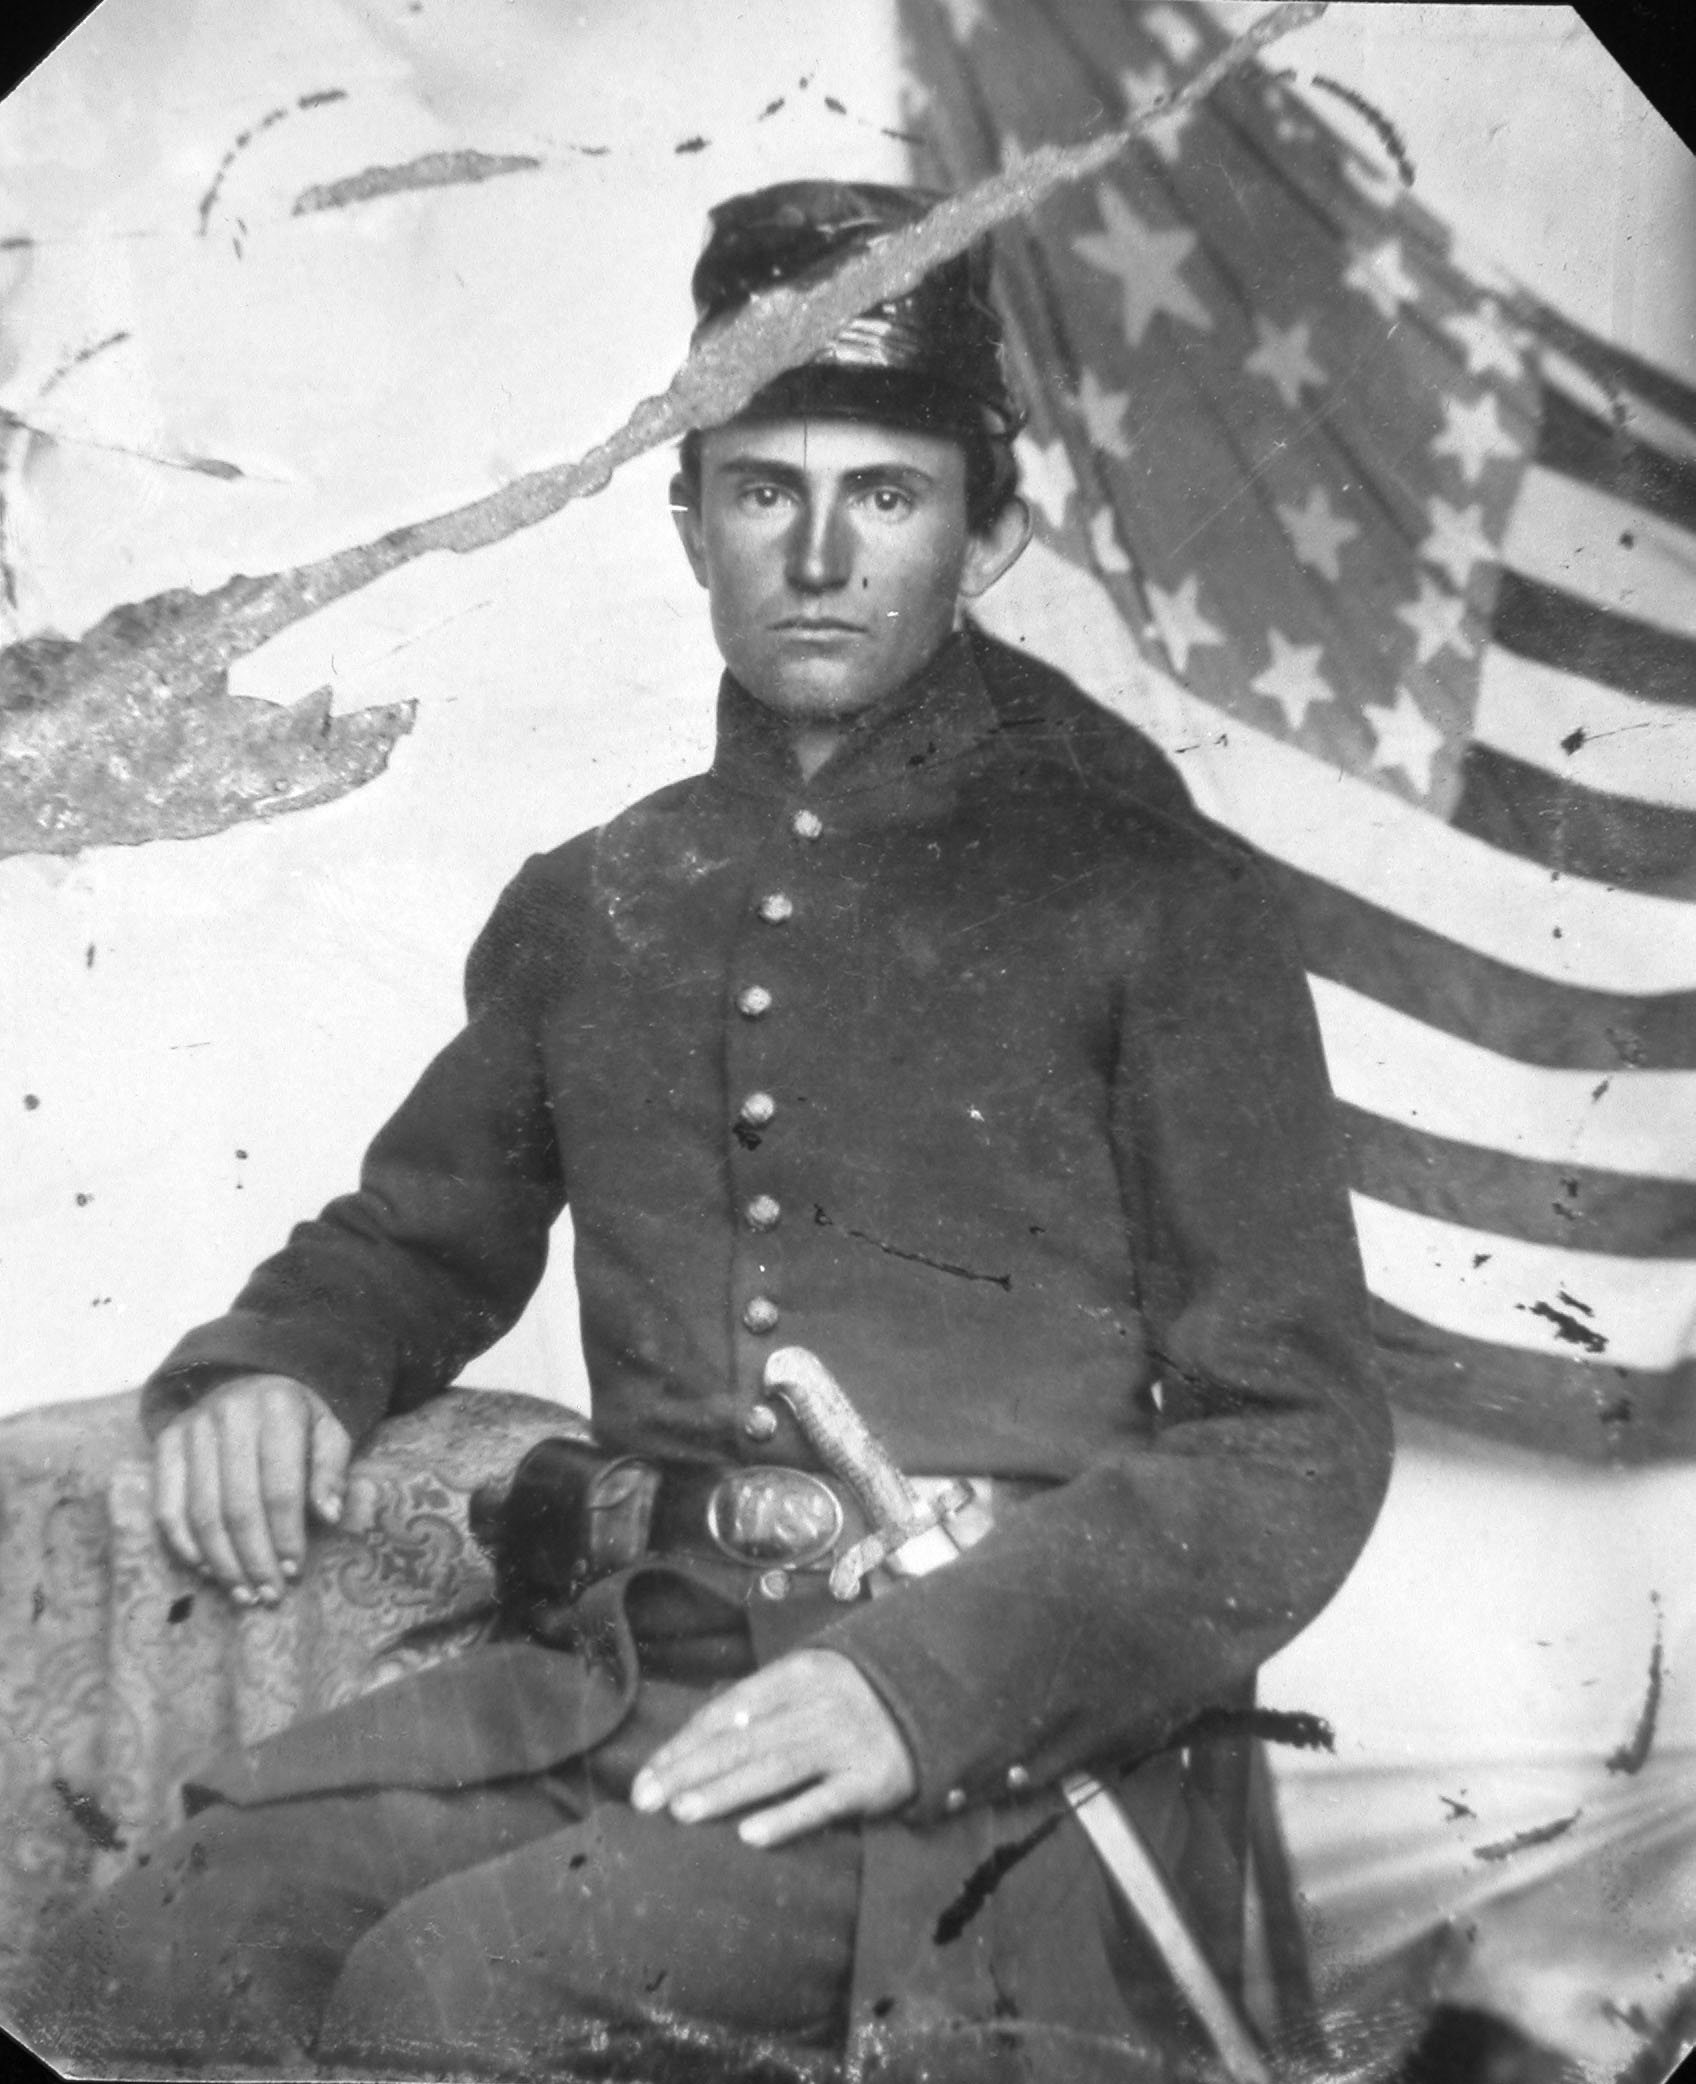 Private Samuel K. Wilson (1841-1865) of the Sturgis Rifles, Illinois Volunteer Infantry (1862).